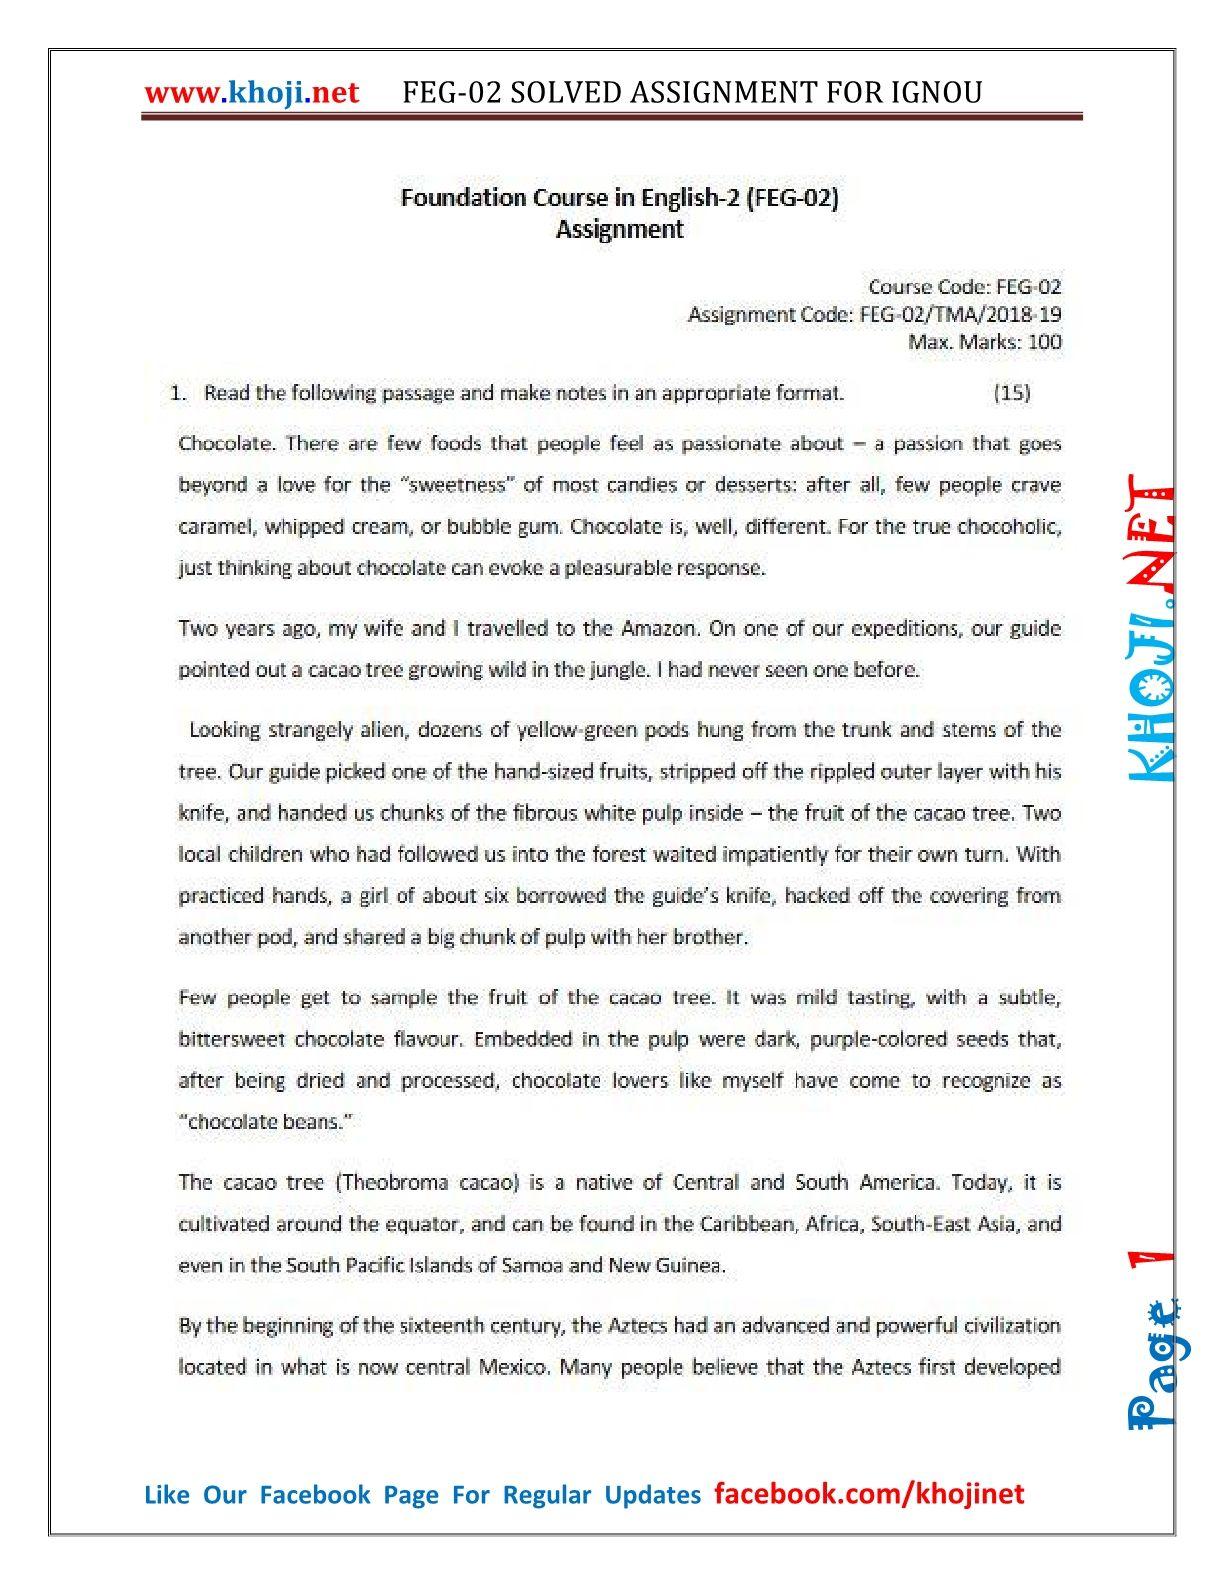 feg 01 question paper